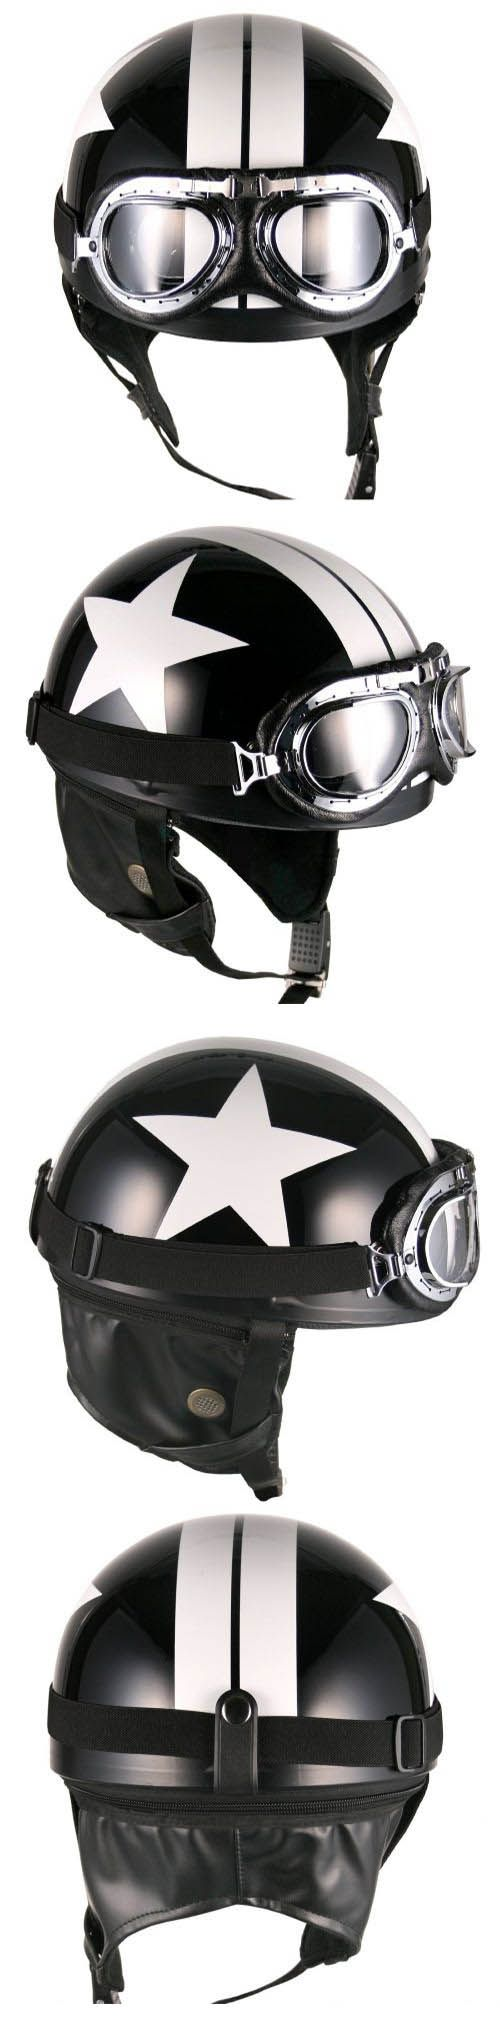 Black White Star Goggle Helmets Half Face Vintage Motorcycle Motorbike | eBay